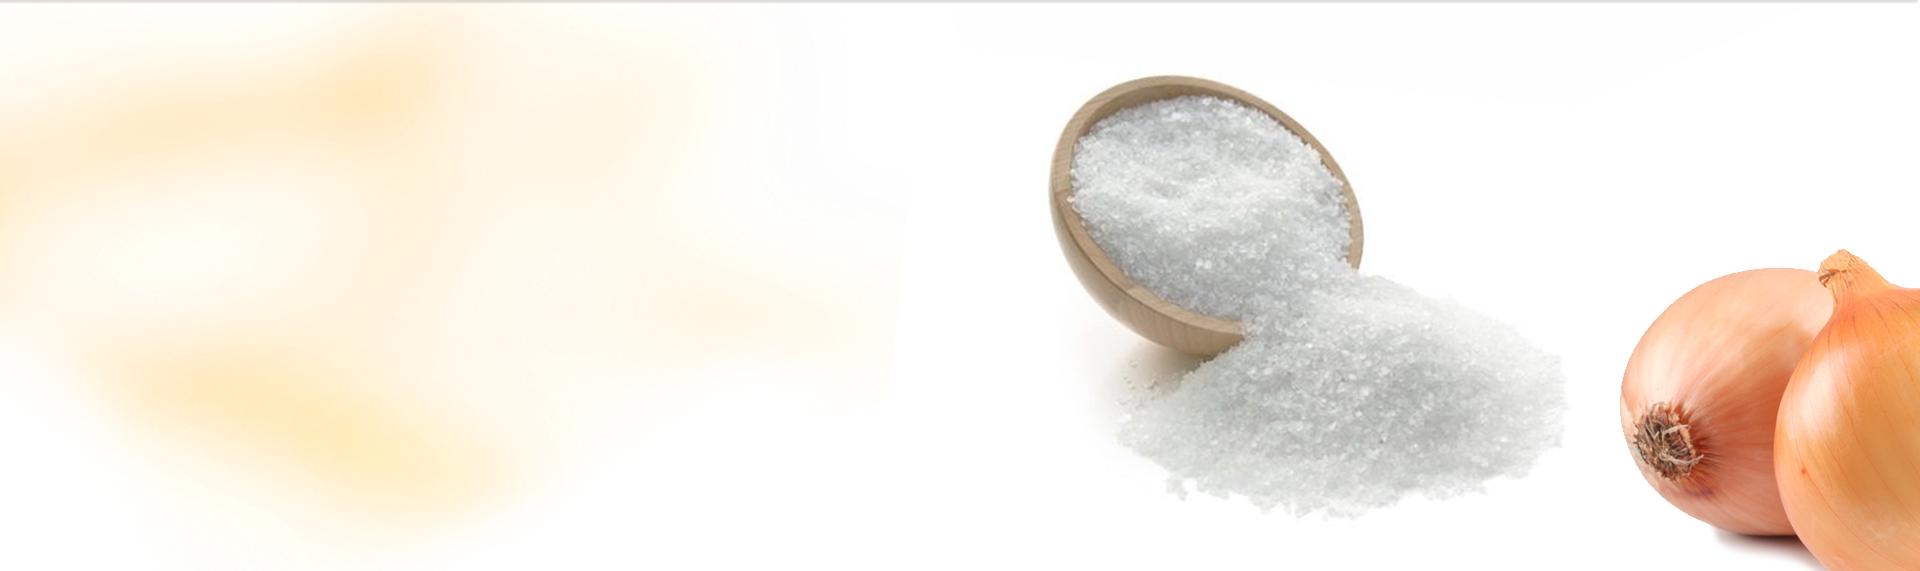 Sal de Cebolla